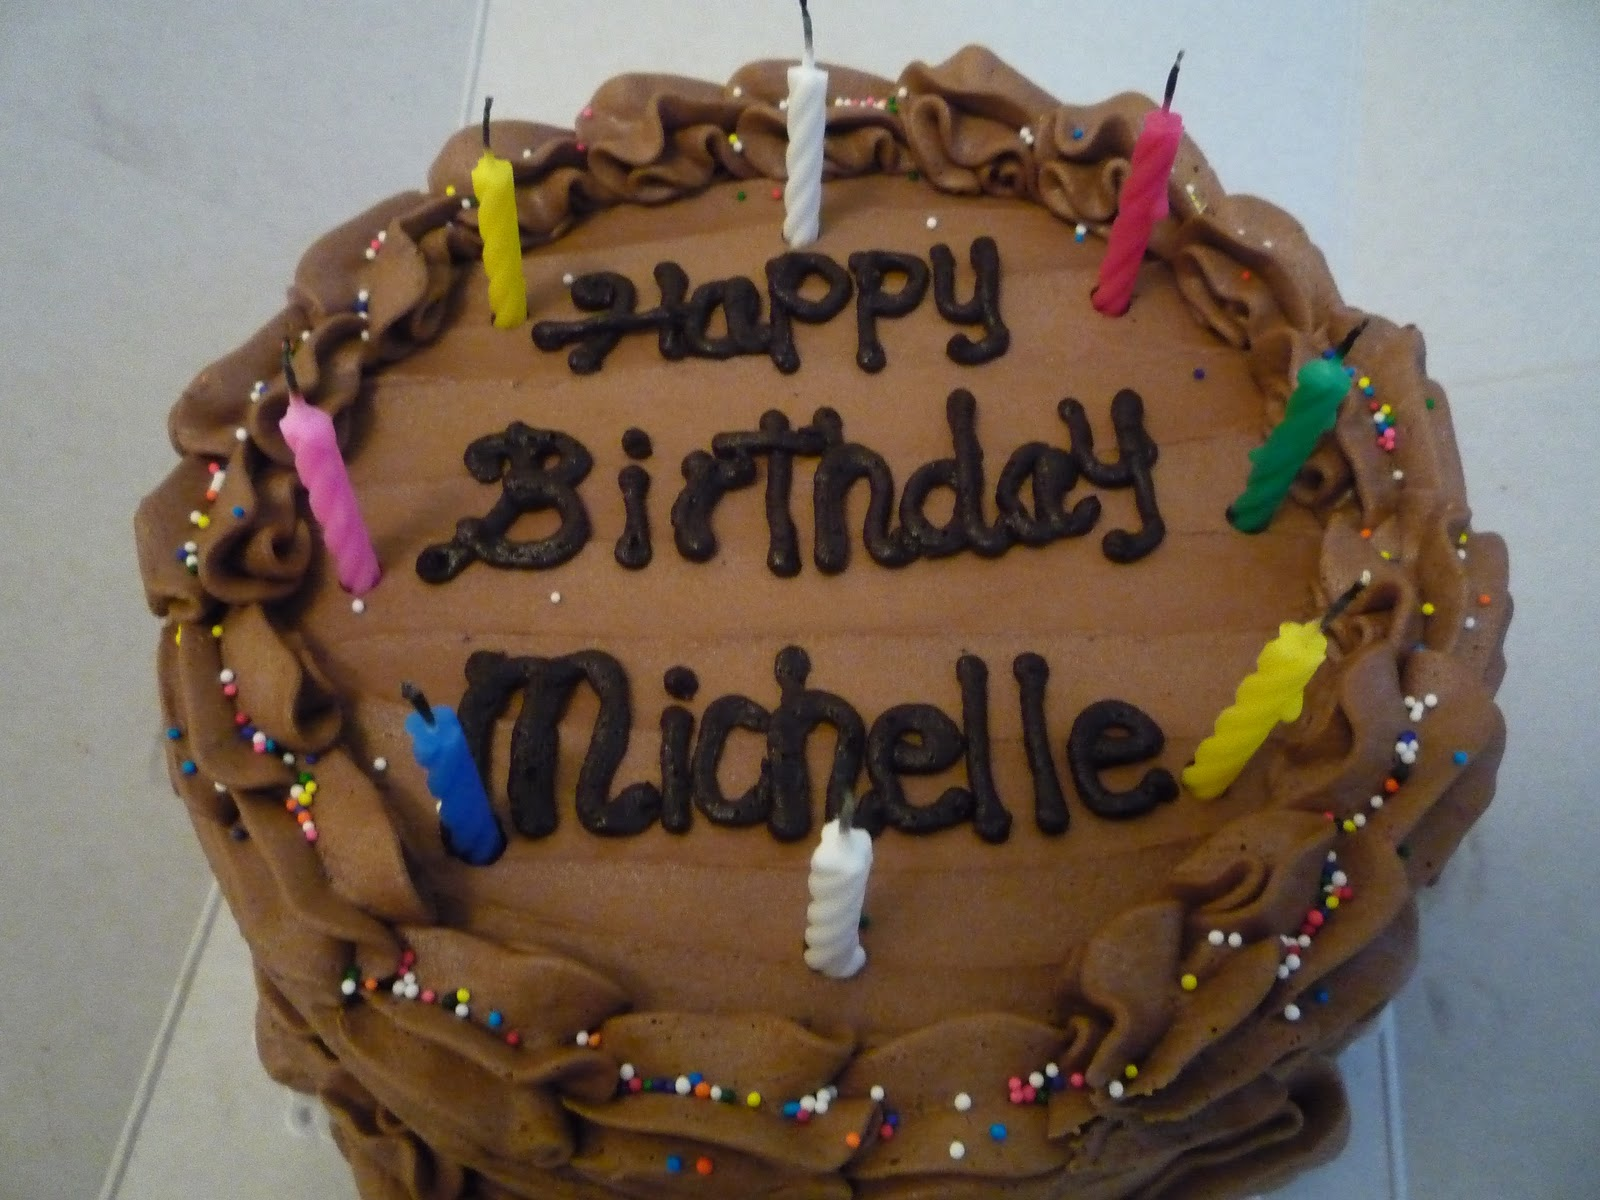 Michelle Cake Artist : Image Gallery happy birthday michelle cake